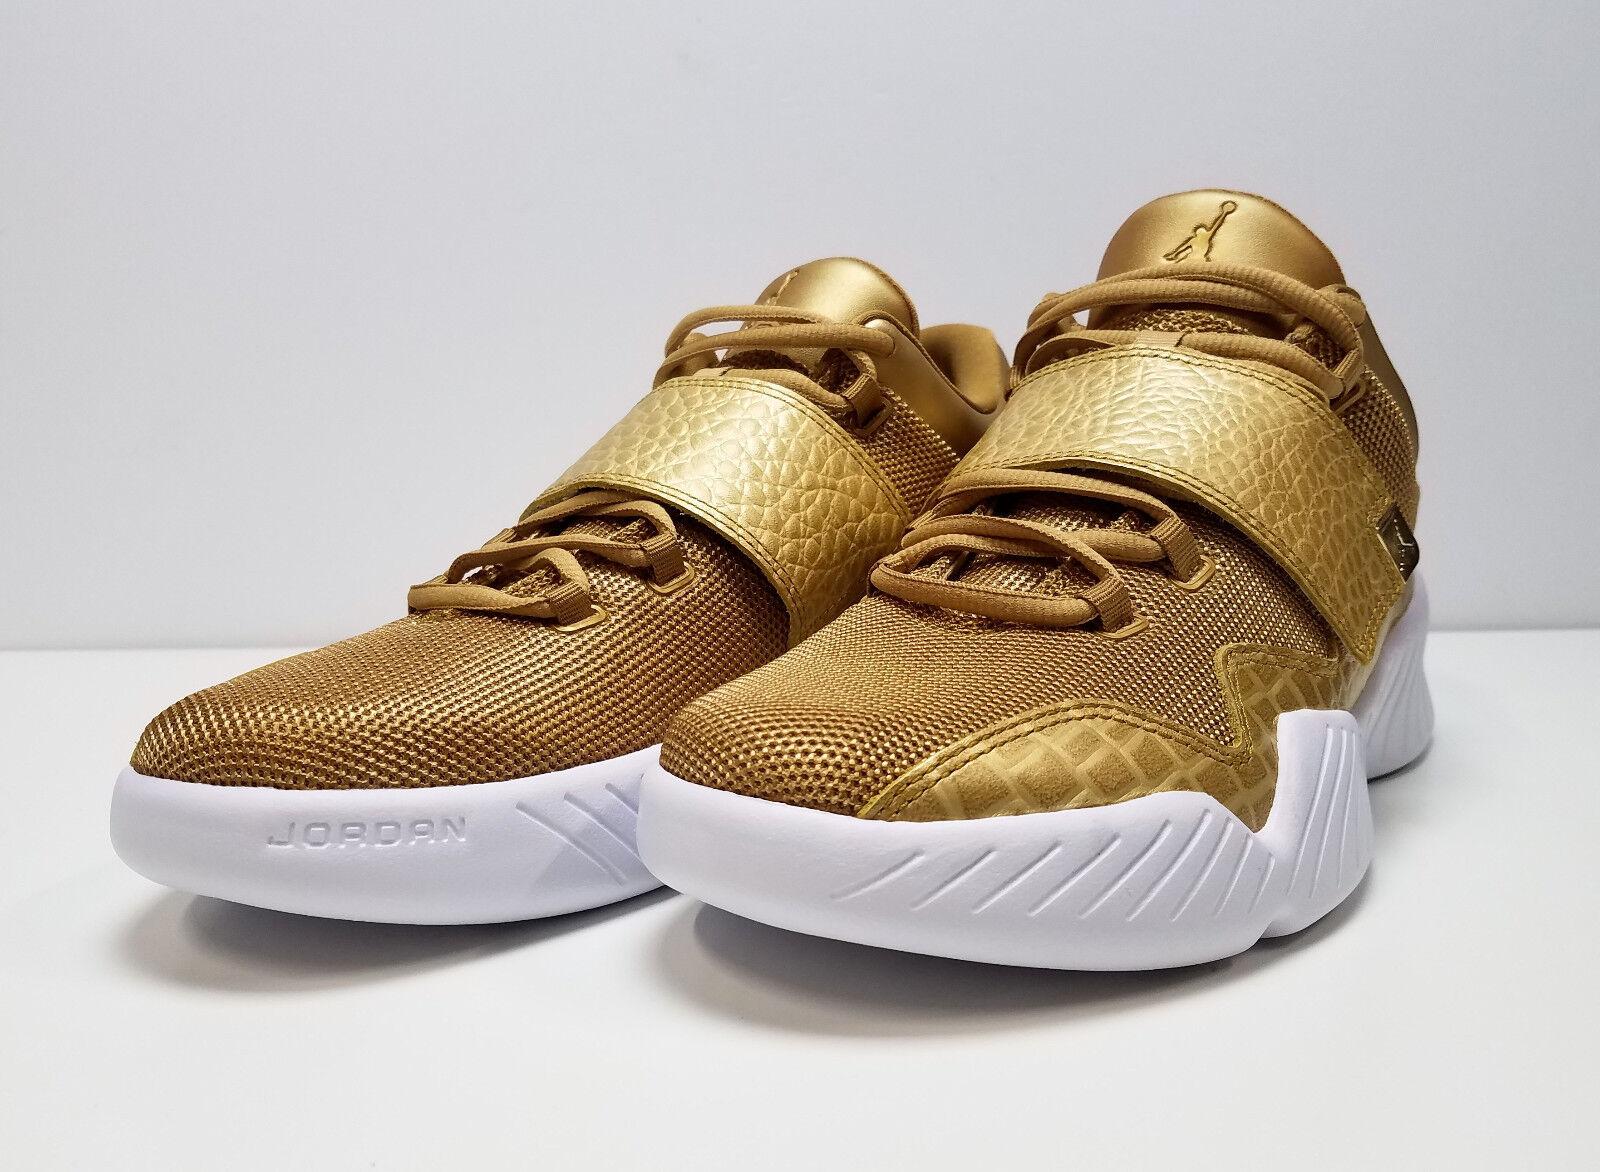 NIKE Air Jordan Men's J23 Cross Training shoes 854557-700 Metallic gold NWOB